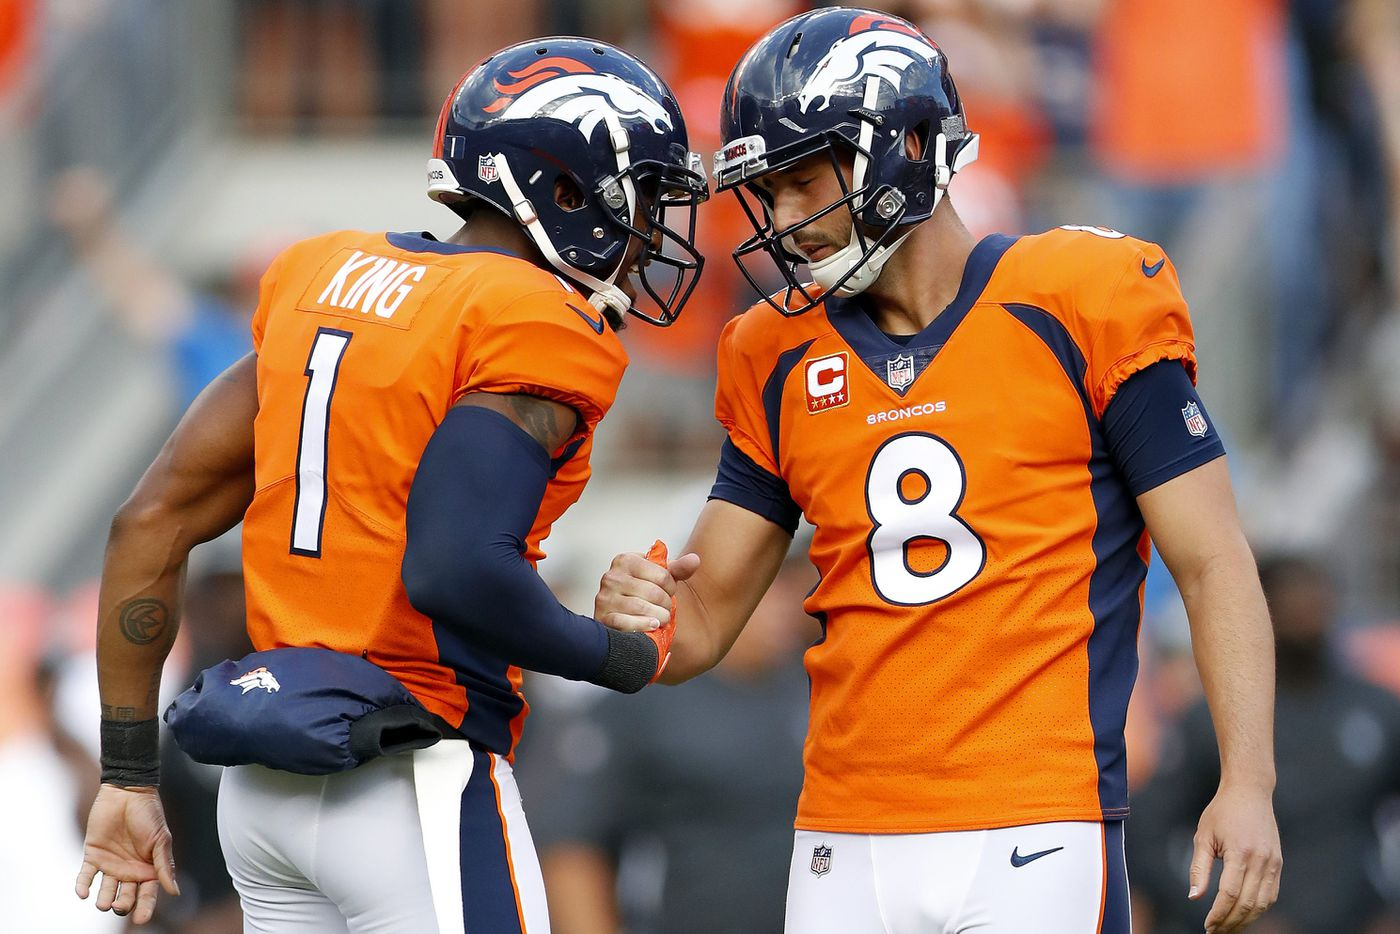 Broncos kicker Brandon McManus weighs in on FanDuel sports-betting dispute